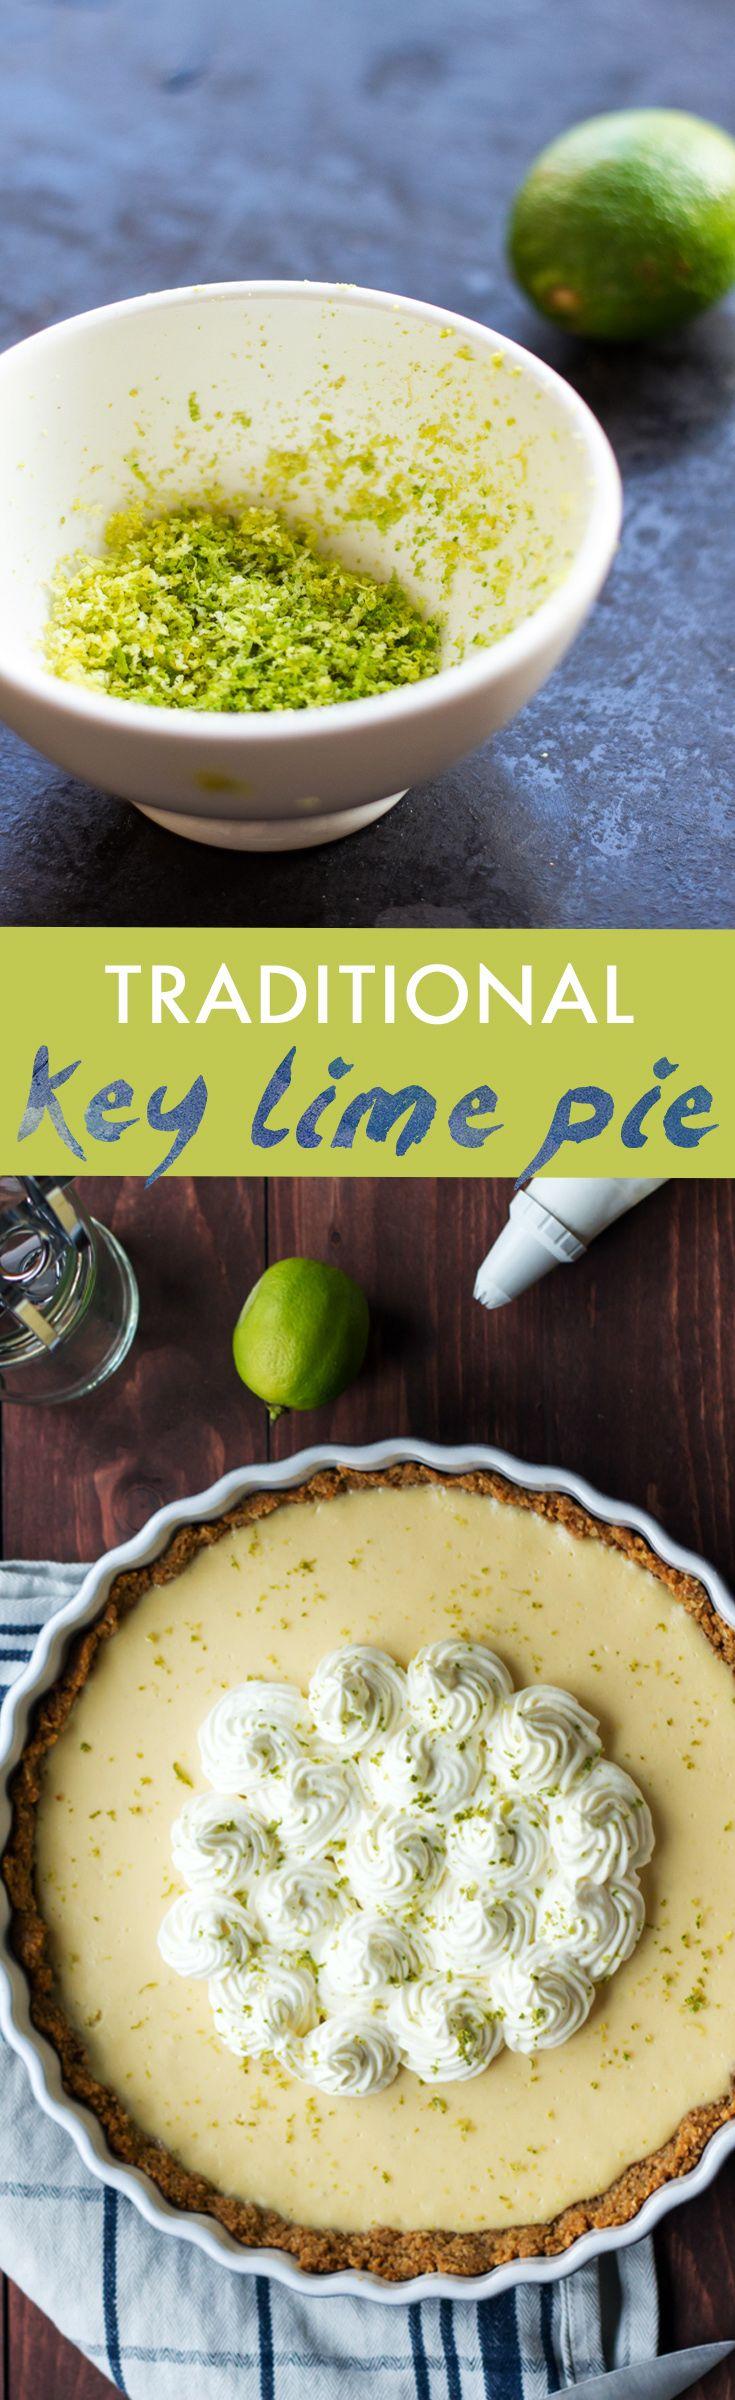 Key lime pie recipe with awesome cookie pie crust. #key #lime #pie | www.haveanotherbite.com